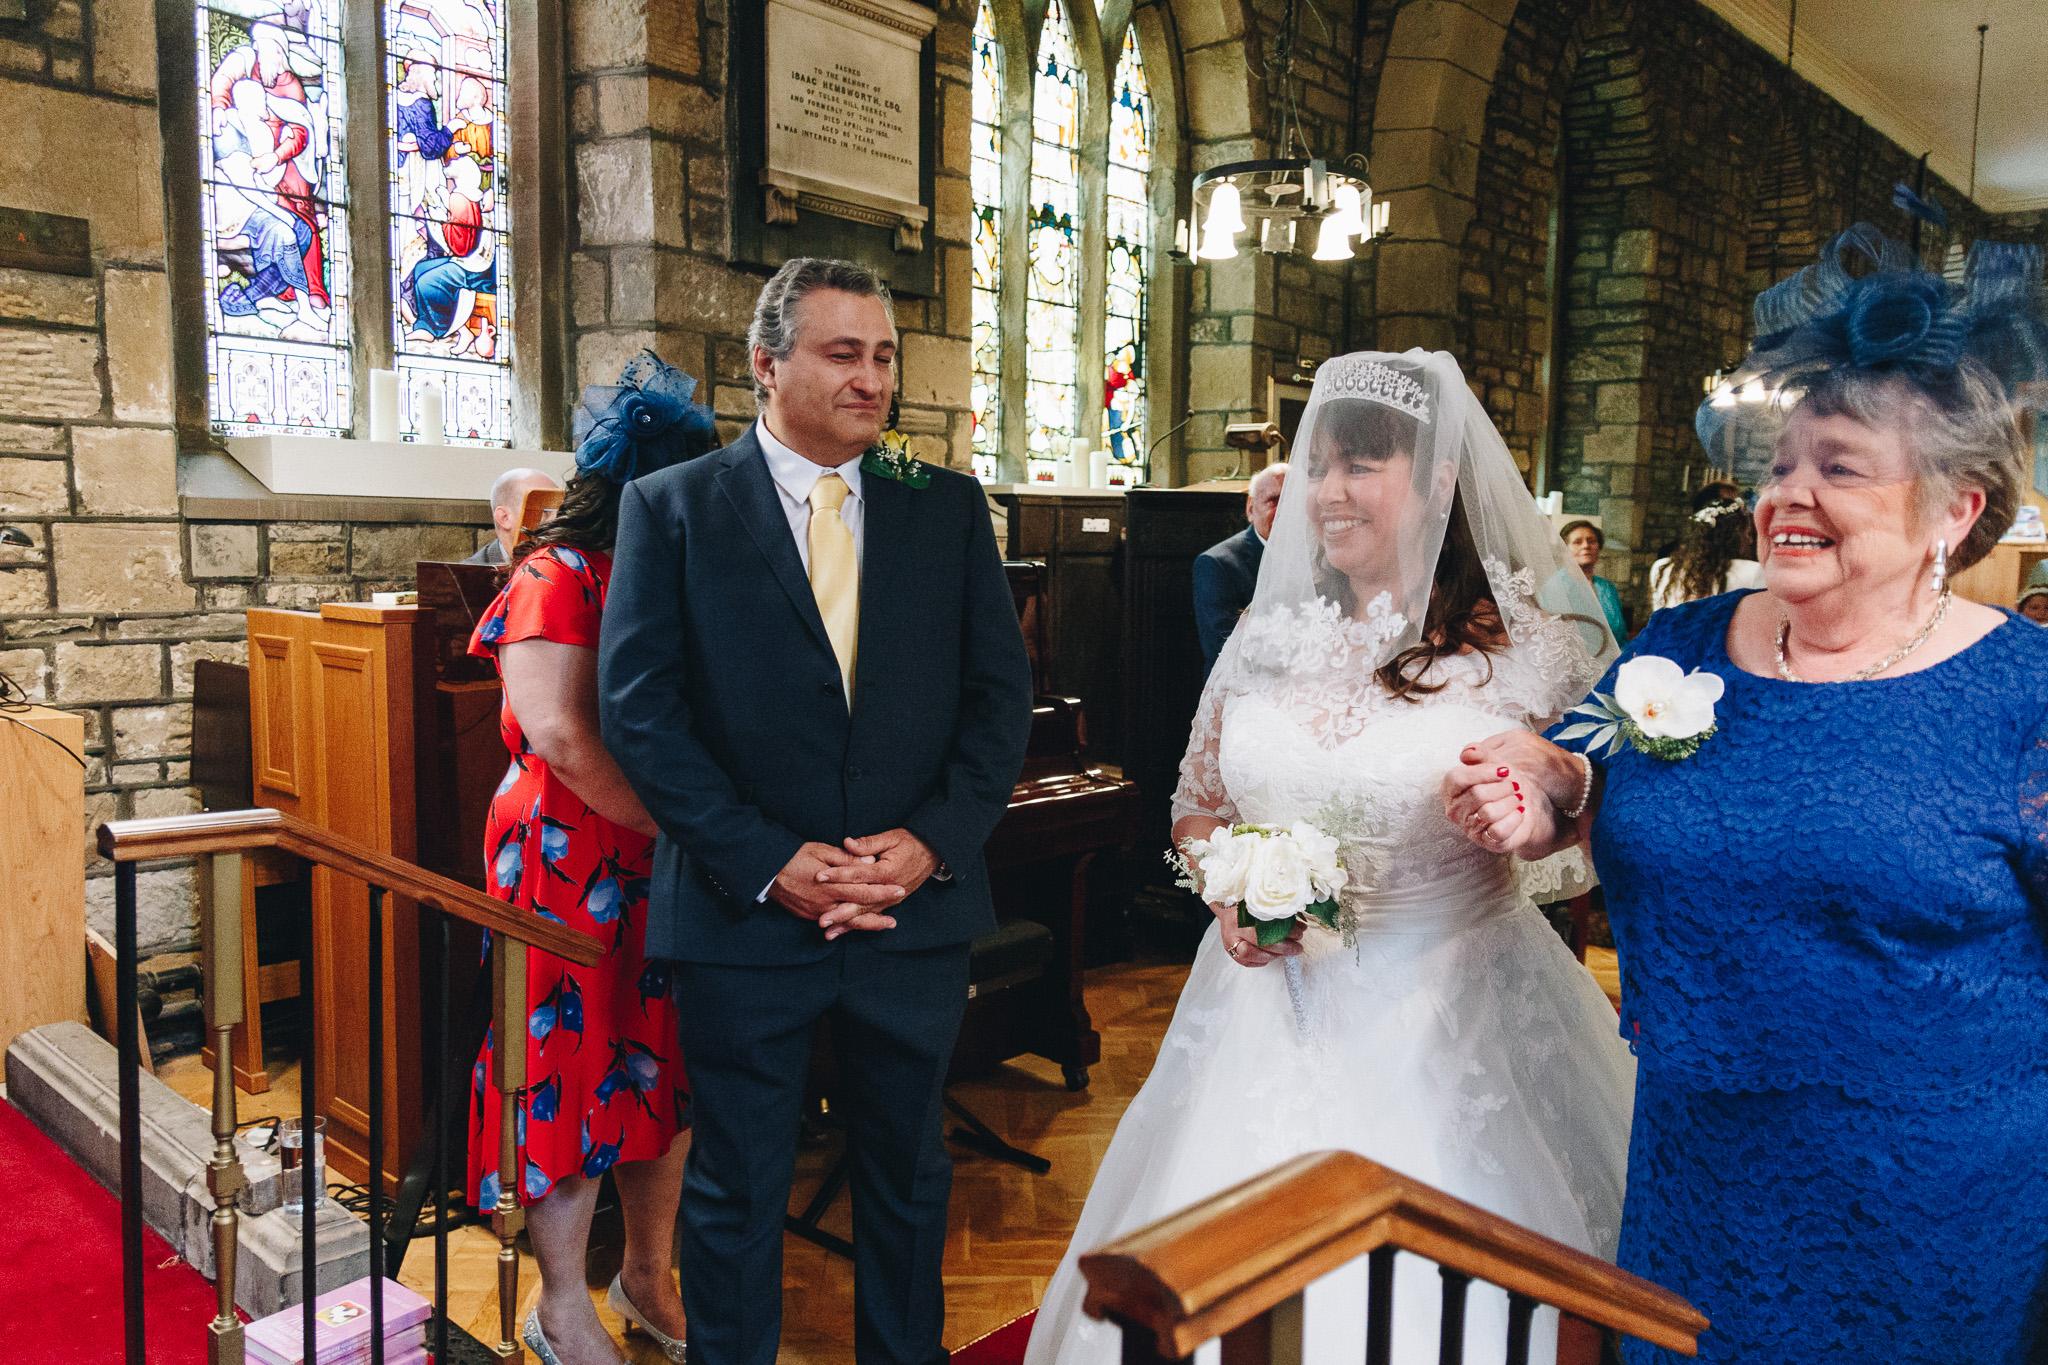 Nat and Sergio Wedding Photos - Website Quality_033.jpg